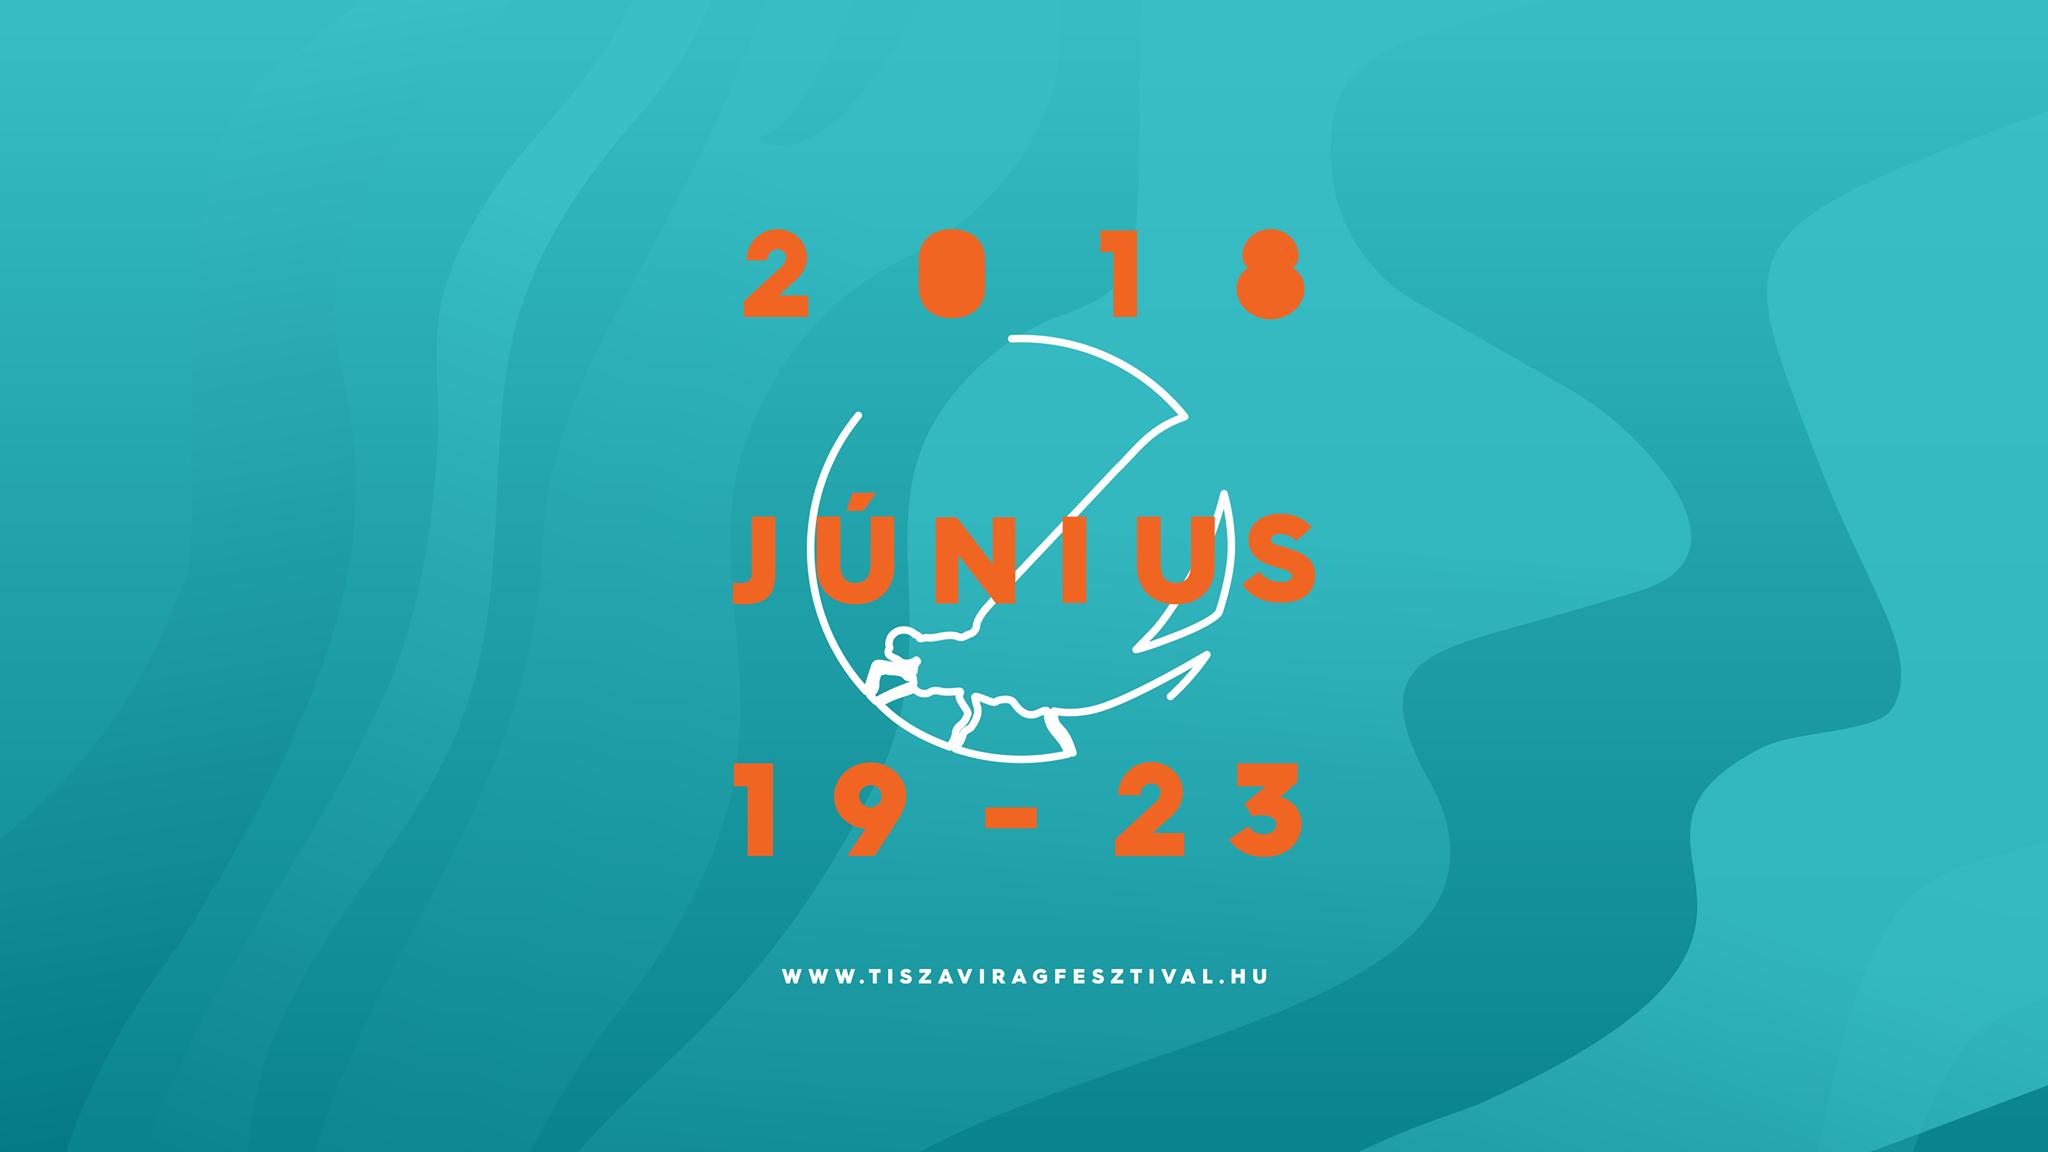 Vera Jonas Experiment in Szolnok - 23 June